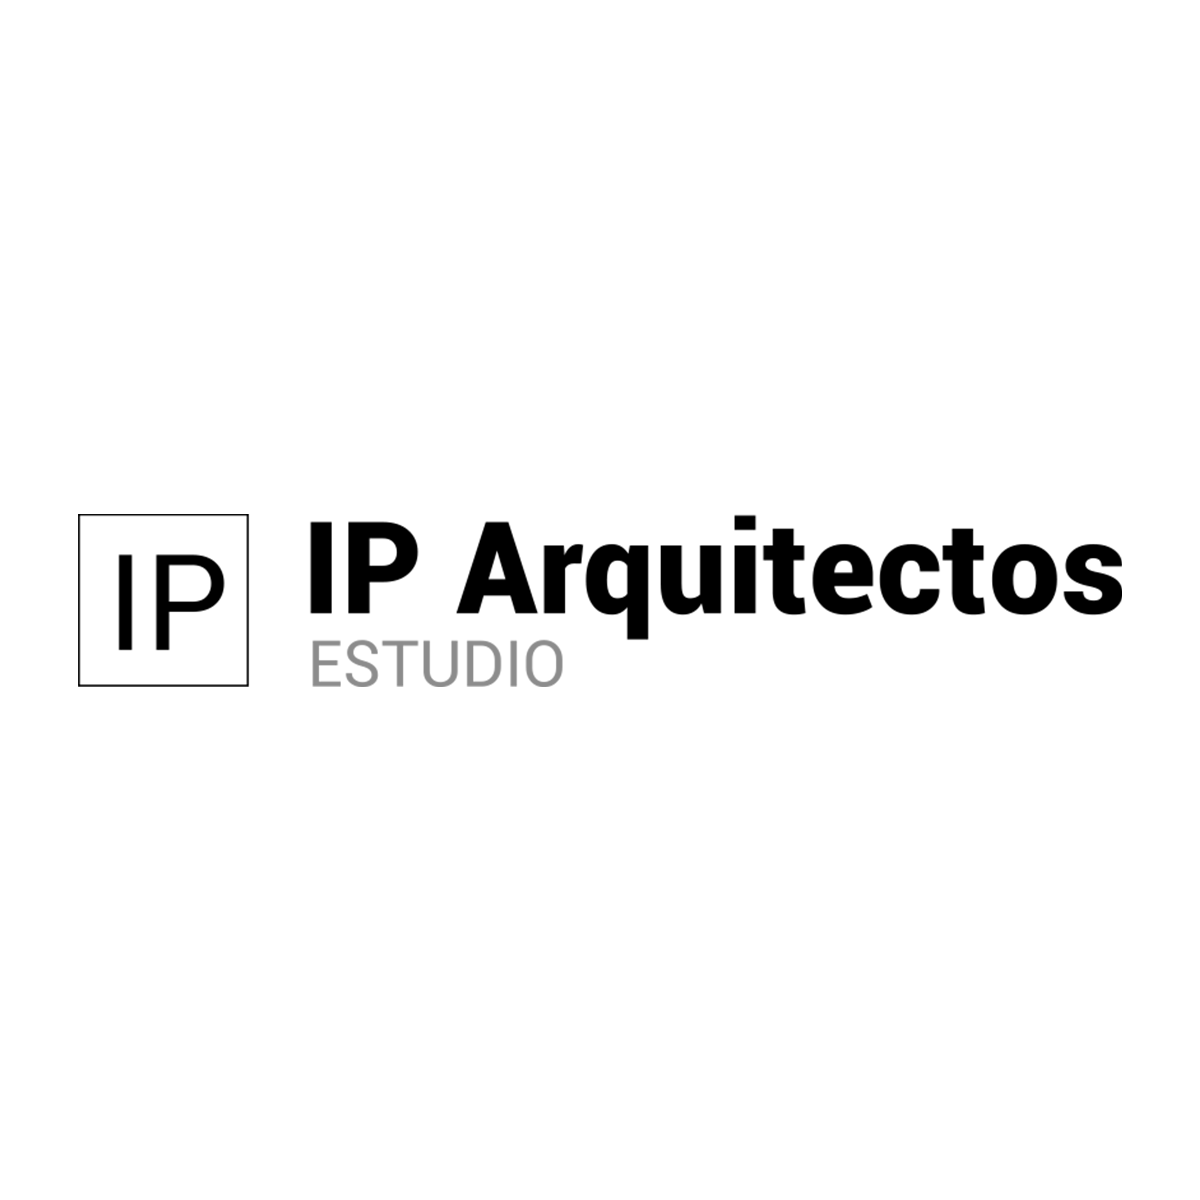 Isaac Peral, IP Arquitectos